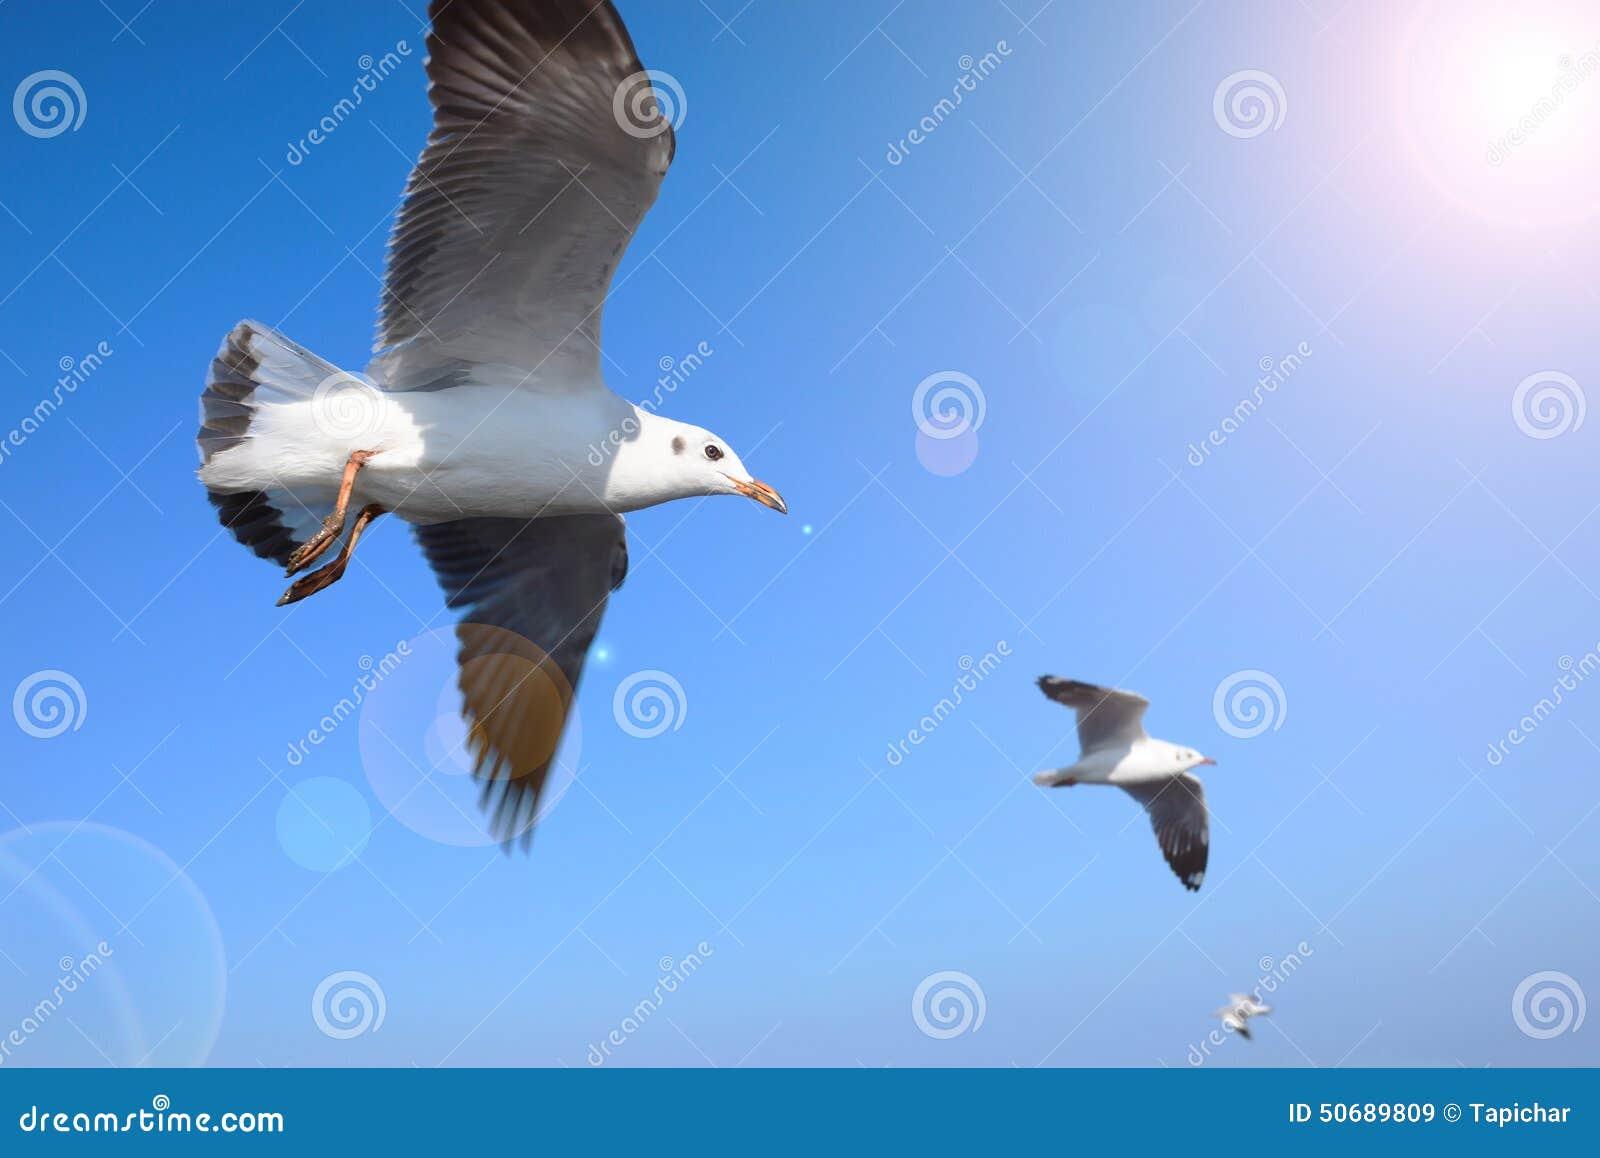 Download 飞行在蓝天的海鸥 库存图片. 图片 包括有 海鸥, 室外, beautifuler, 天气, 航空, 风景 - 50689809